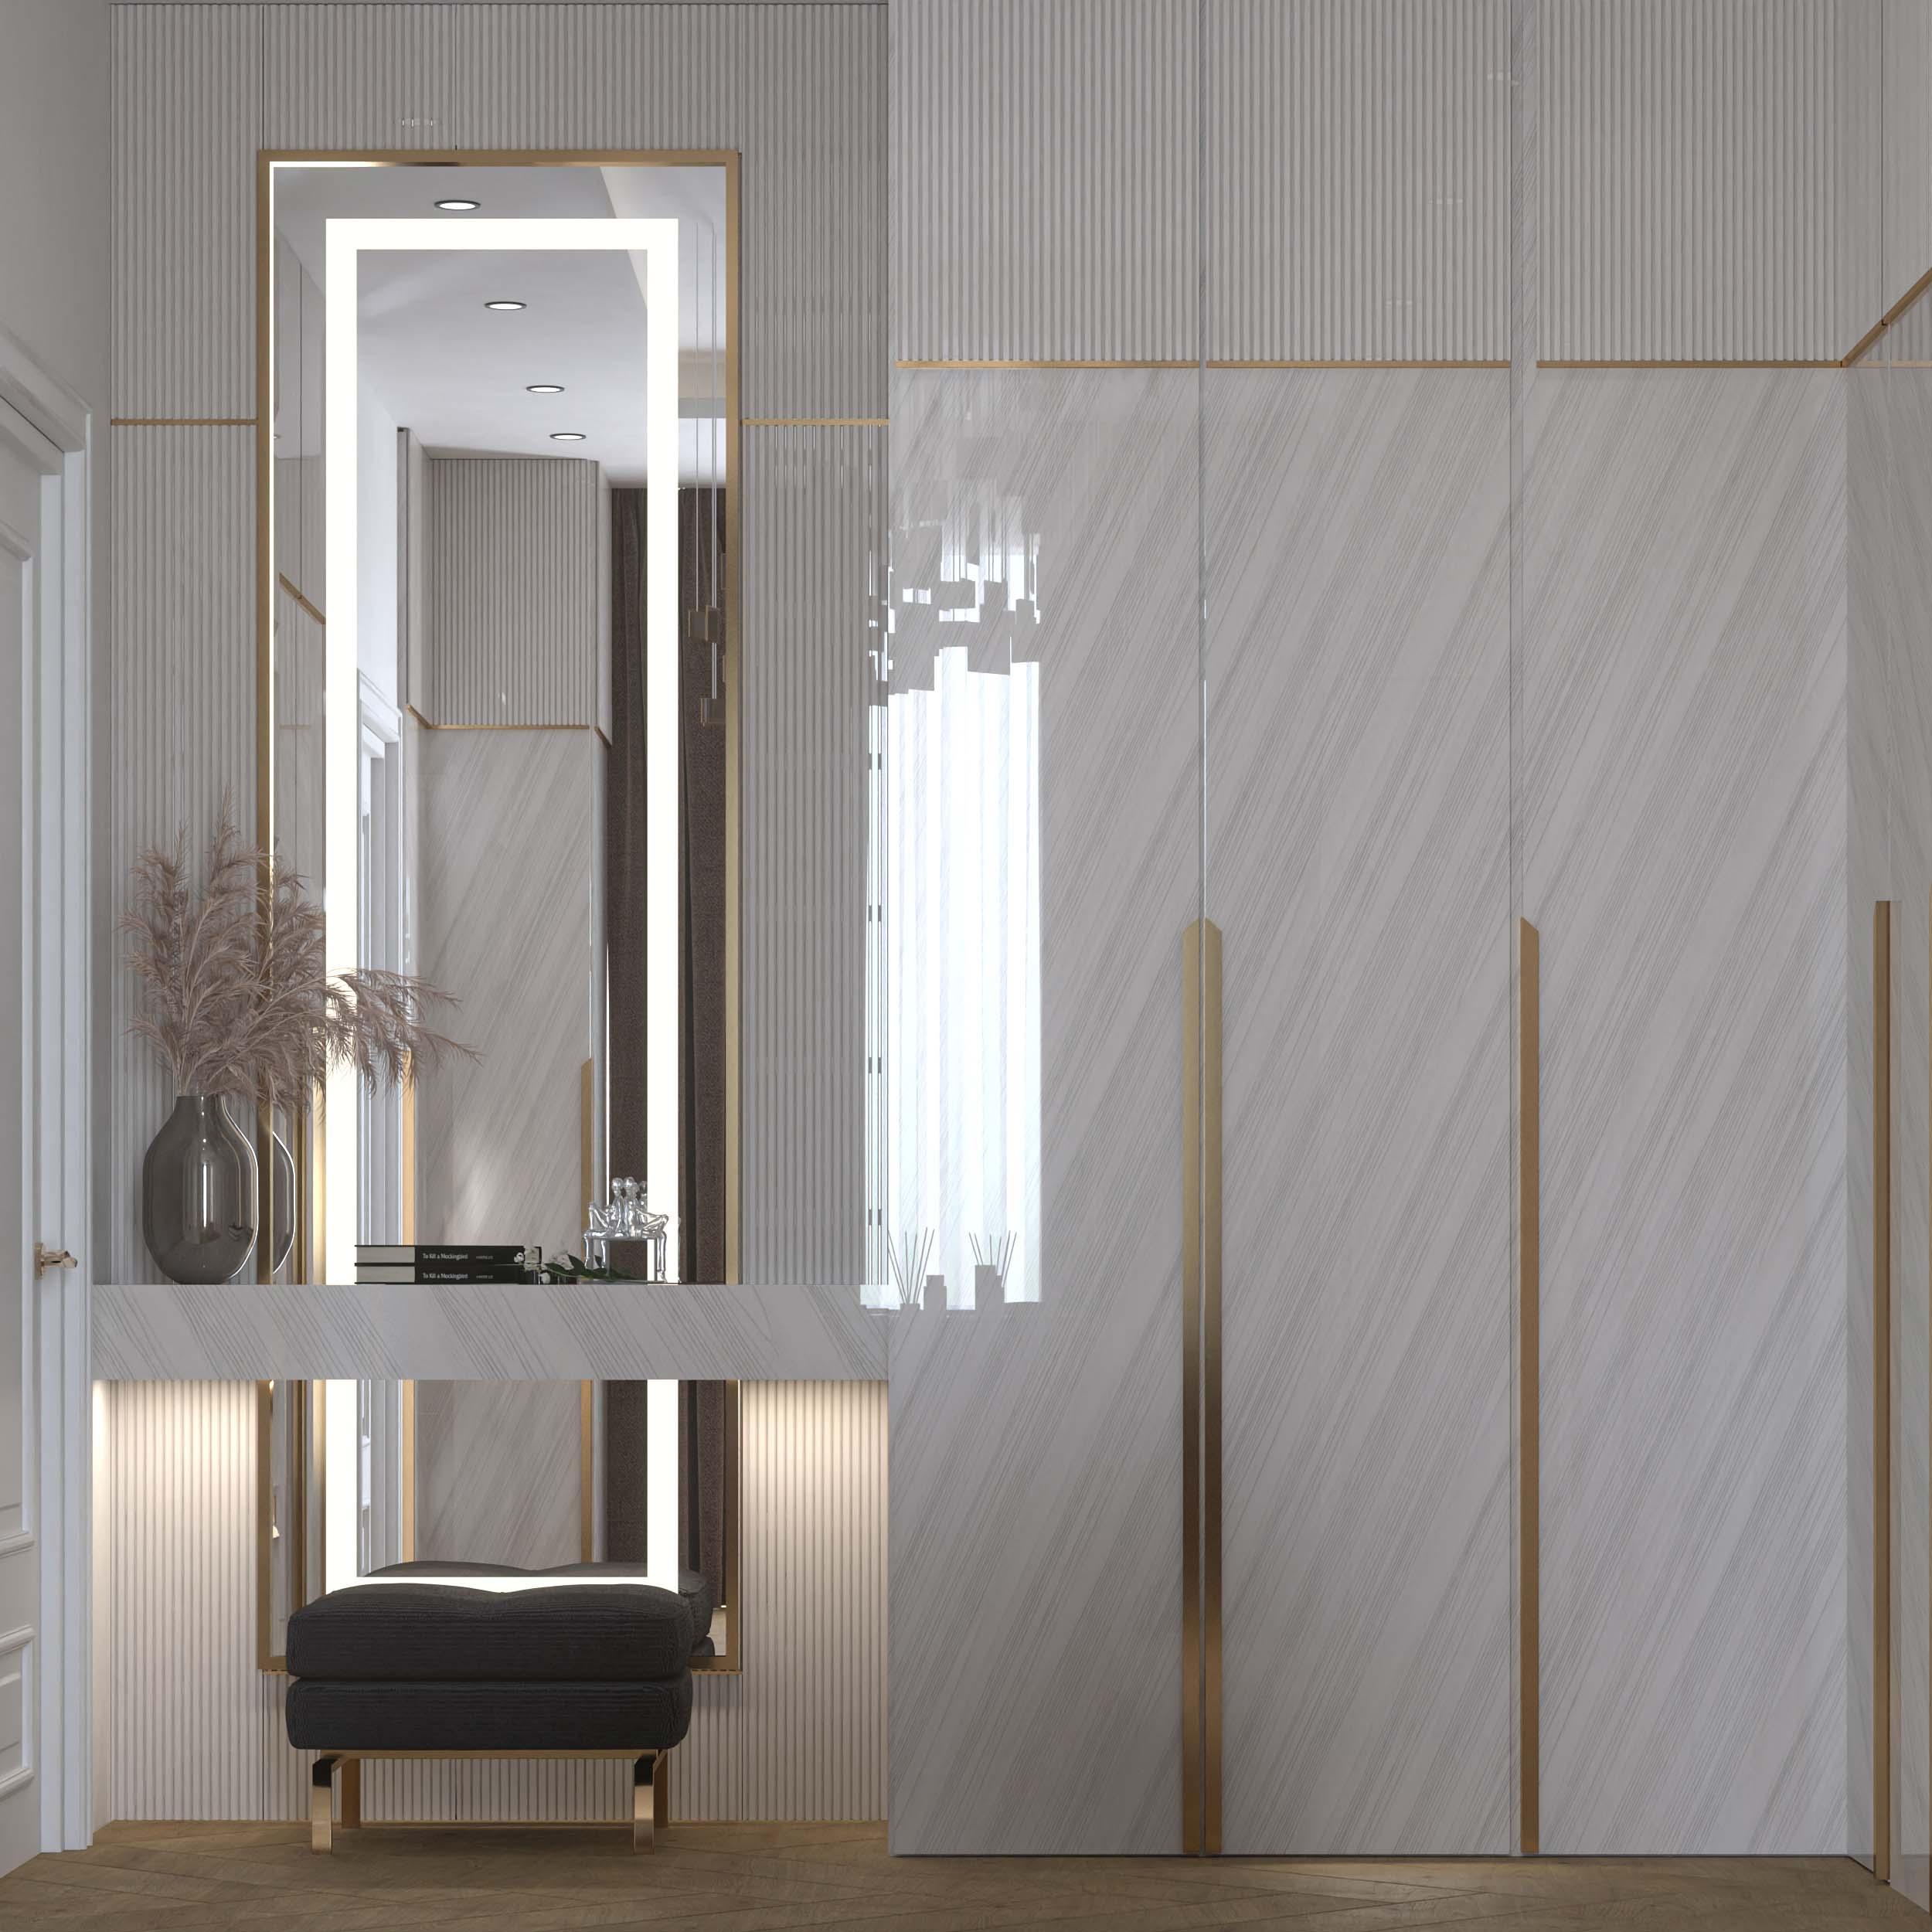 mirror design - white - golden lines - dressing rooms designs